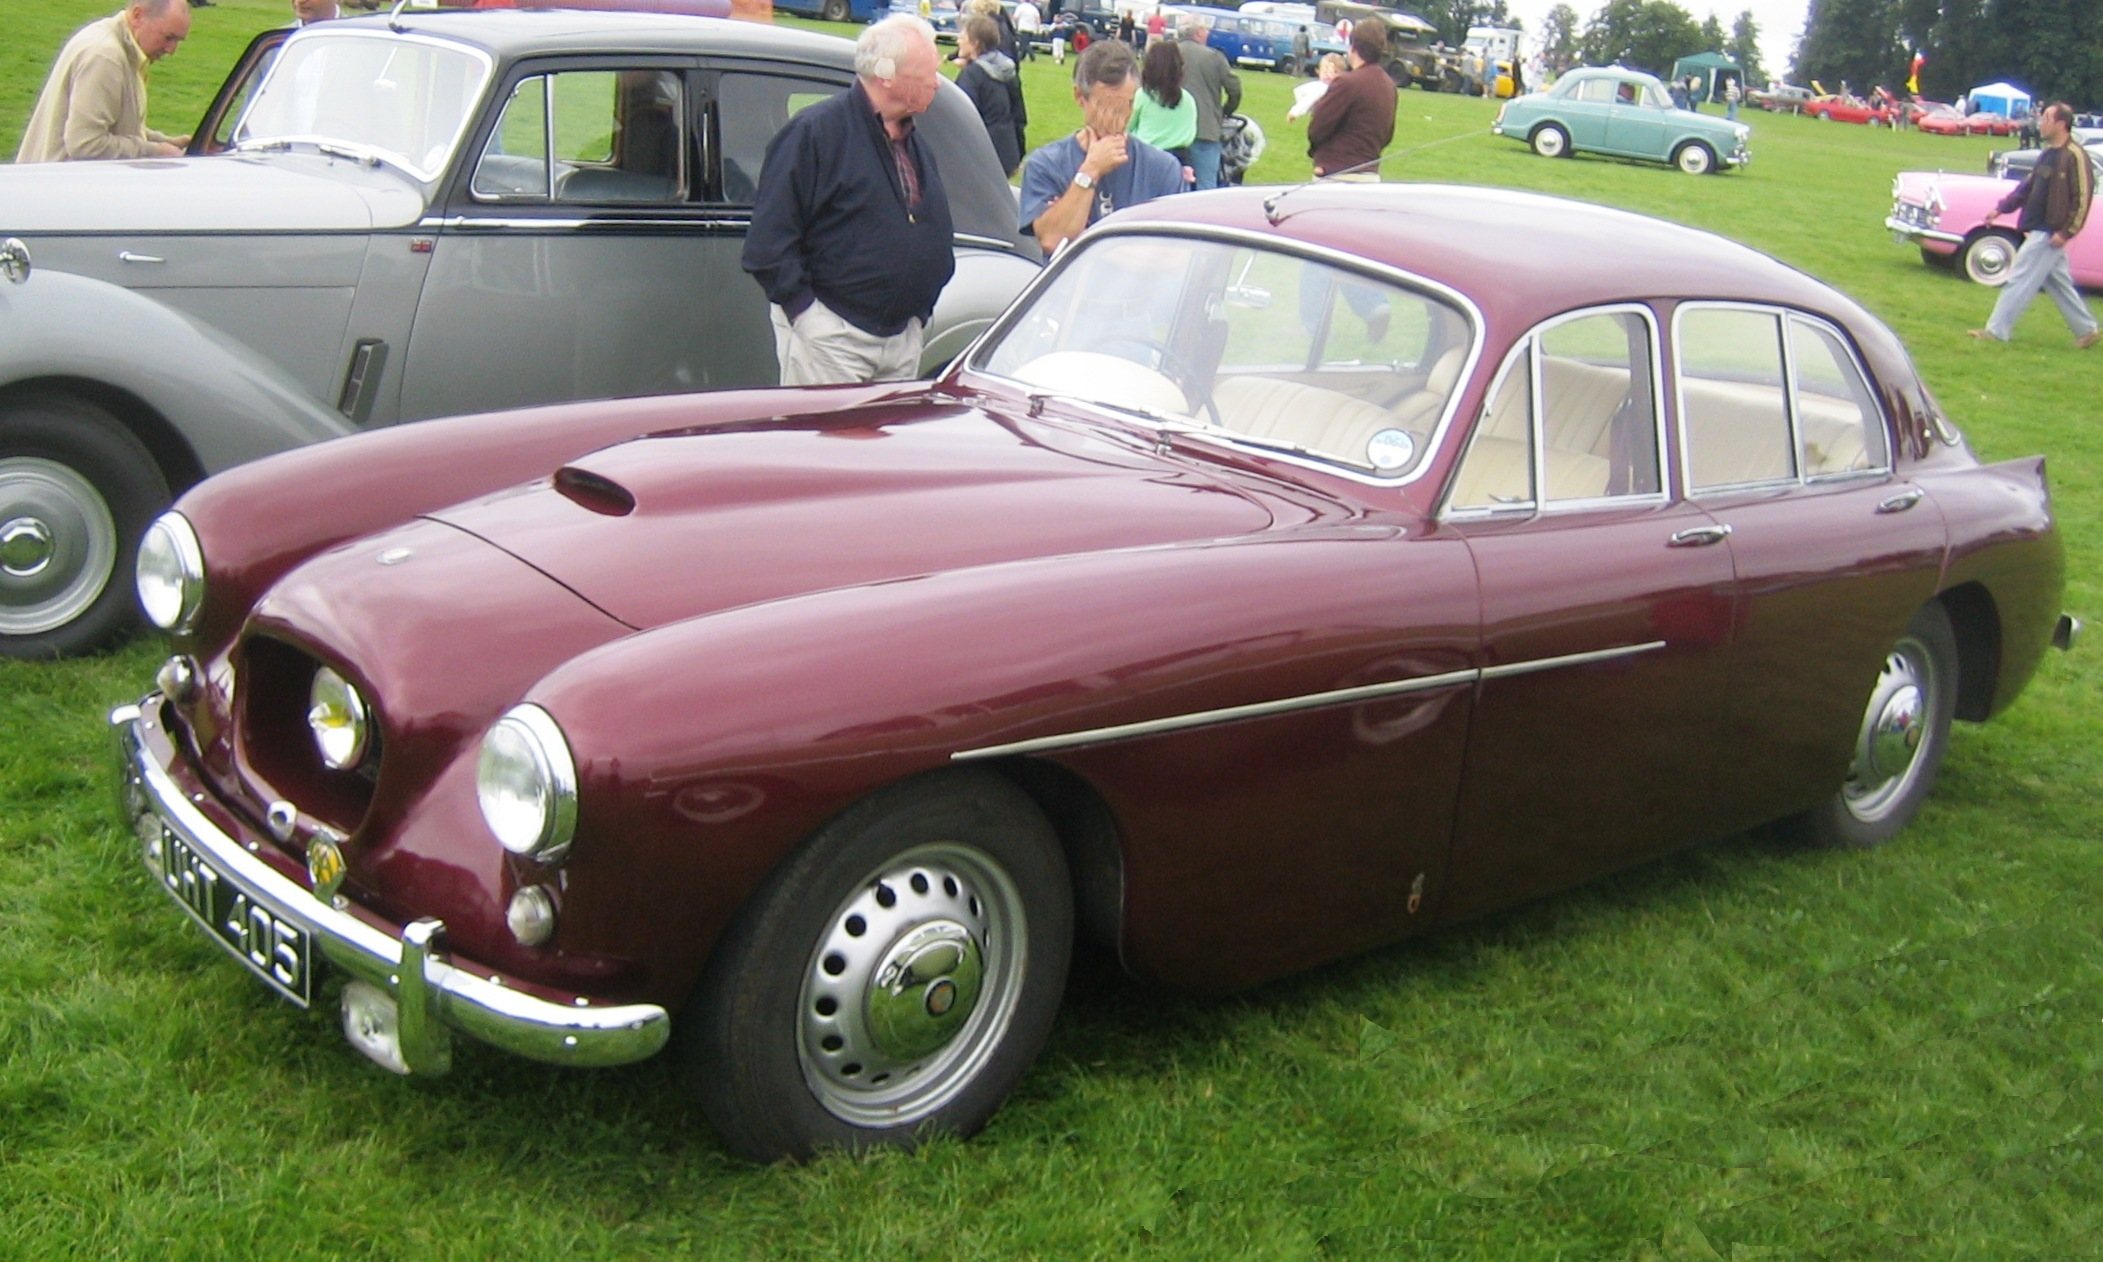 Cars Under 800 >> File:Bristol 405 ca 1955.jpg - Wikimedia Commons